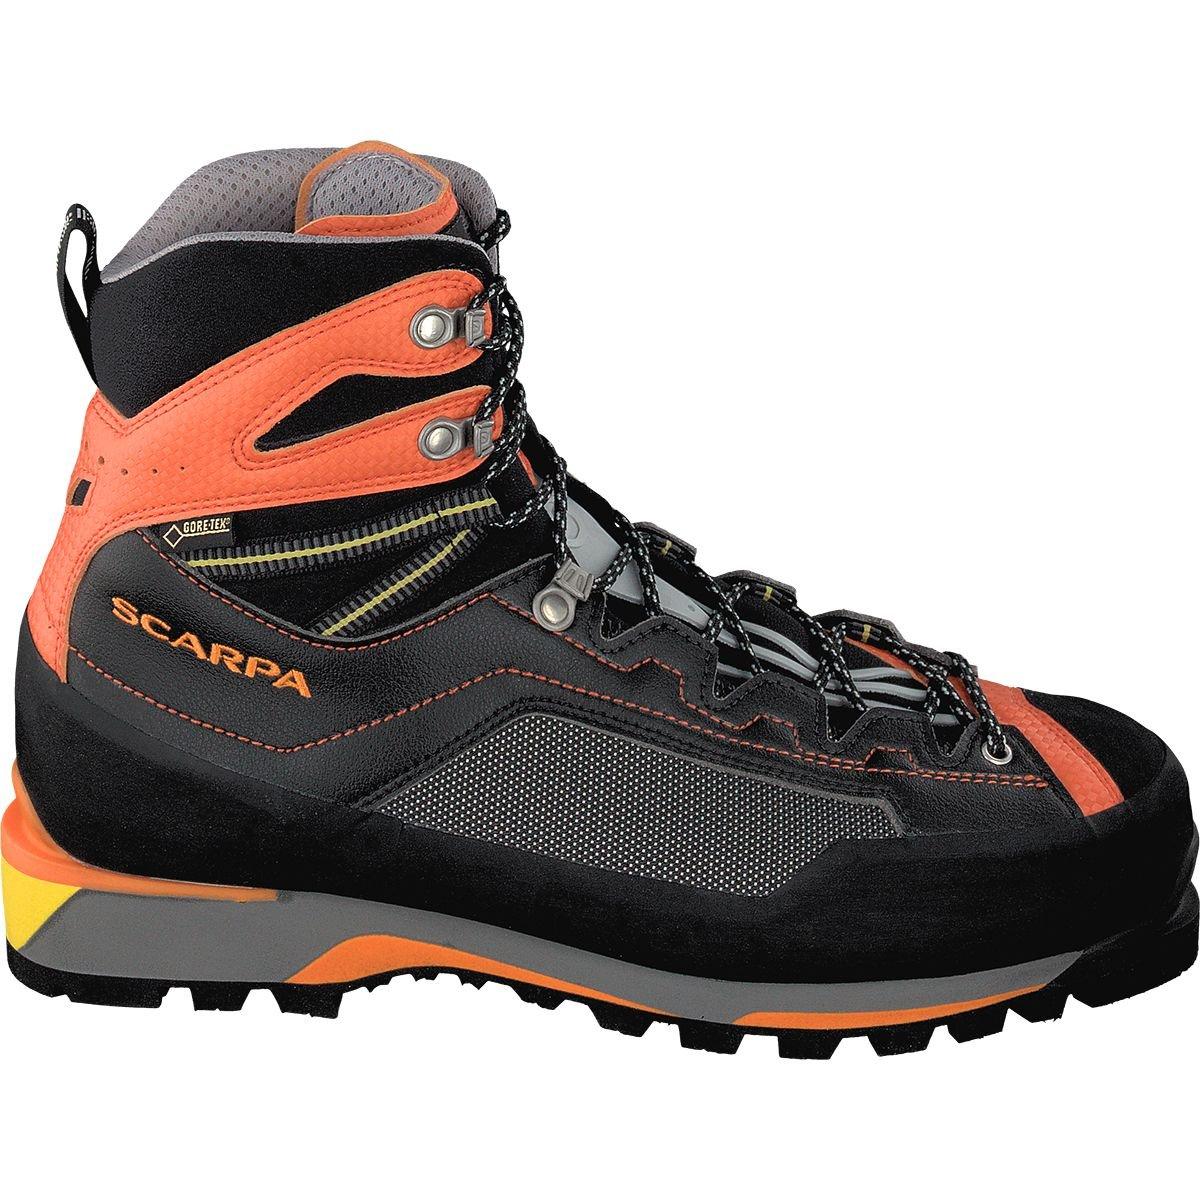 d2d9d8dff31 Scarpa Rebel Pro GTX black 46.0 EU: Amazon.co.uk: Sports & Outdoors